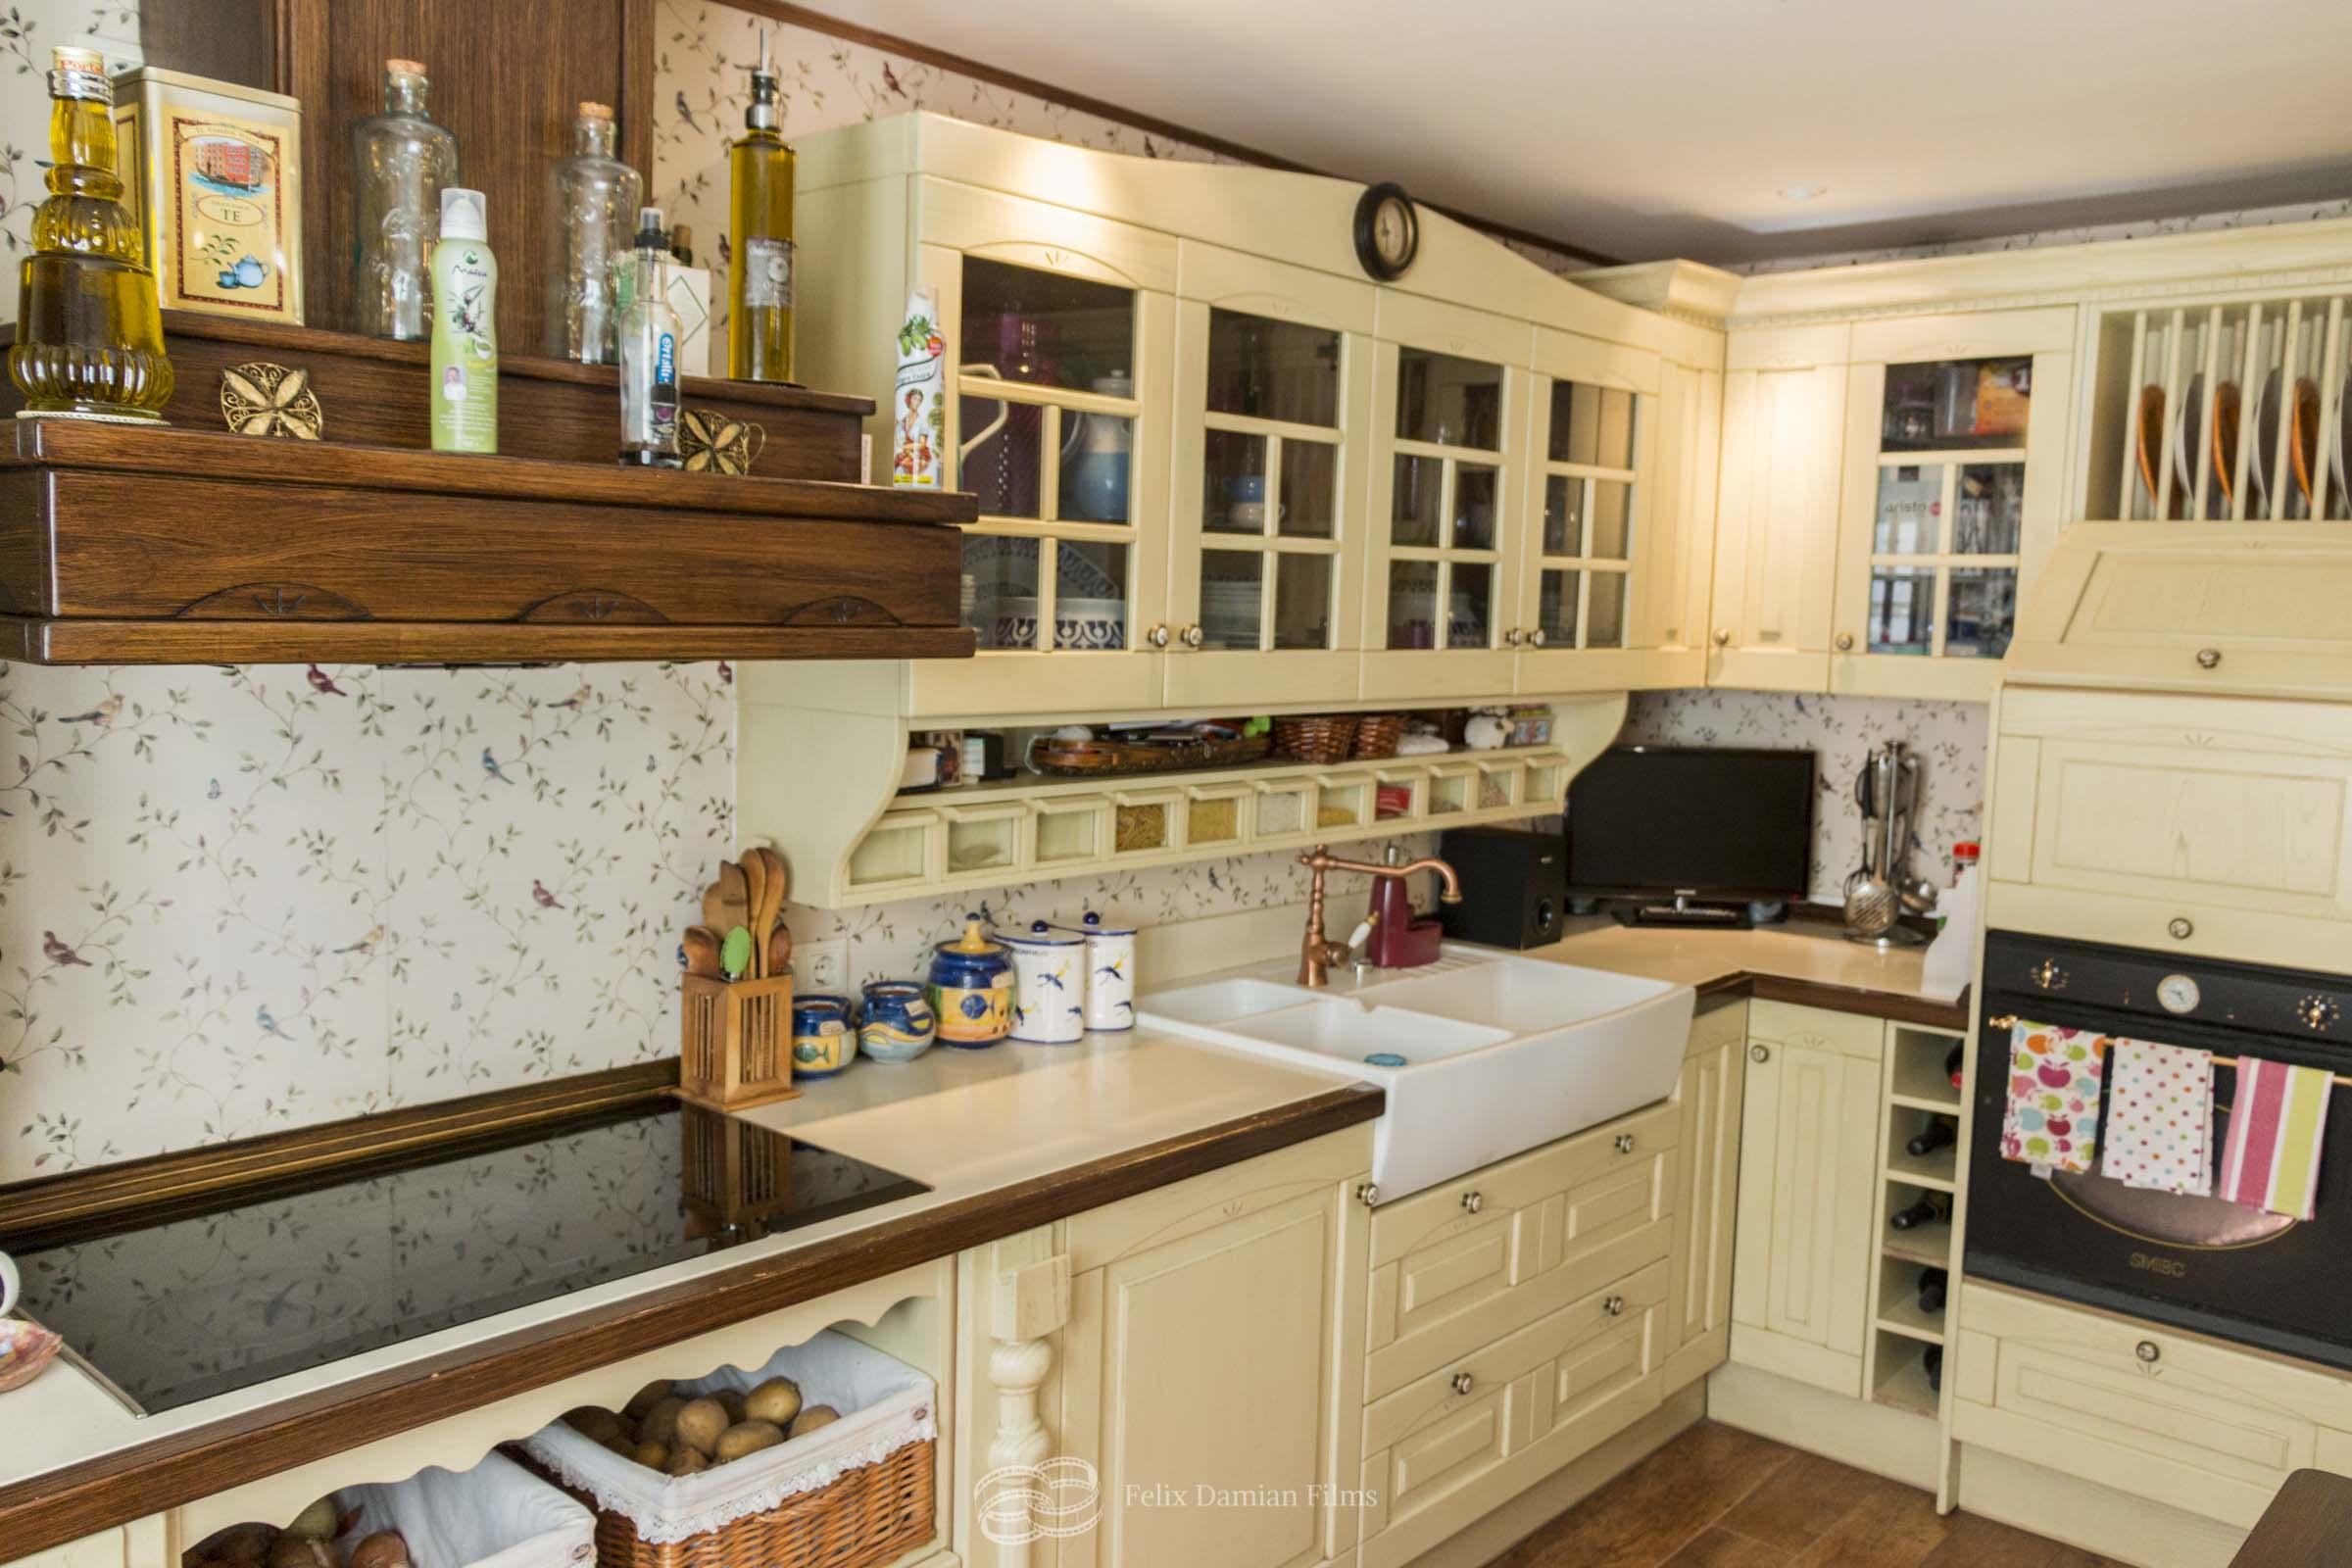 real estate fotografo de interiores madrid-5